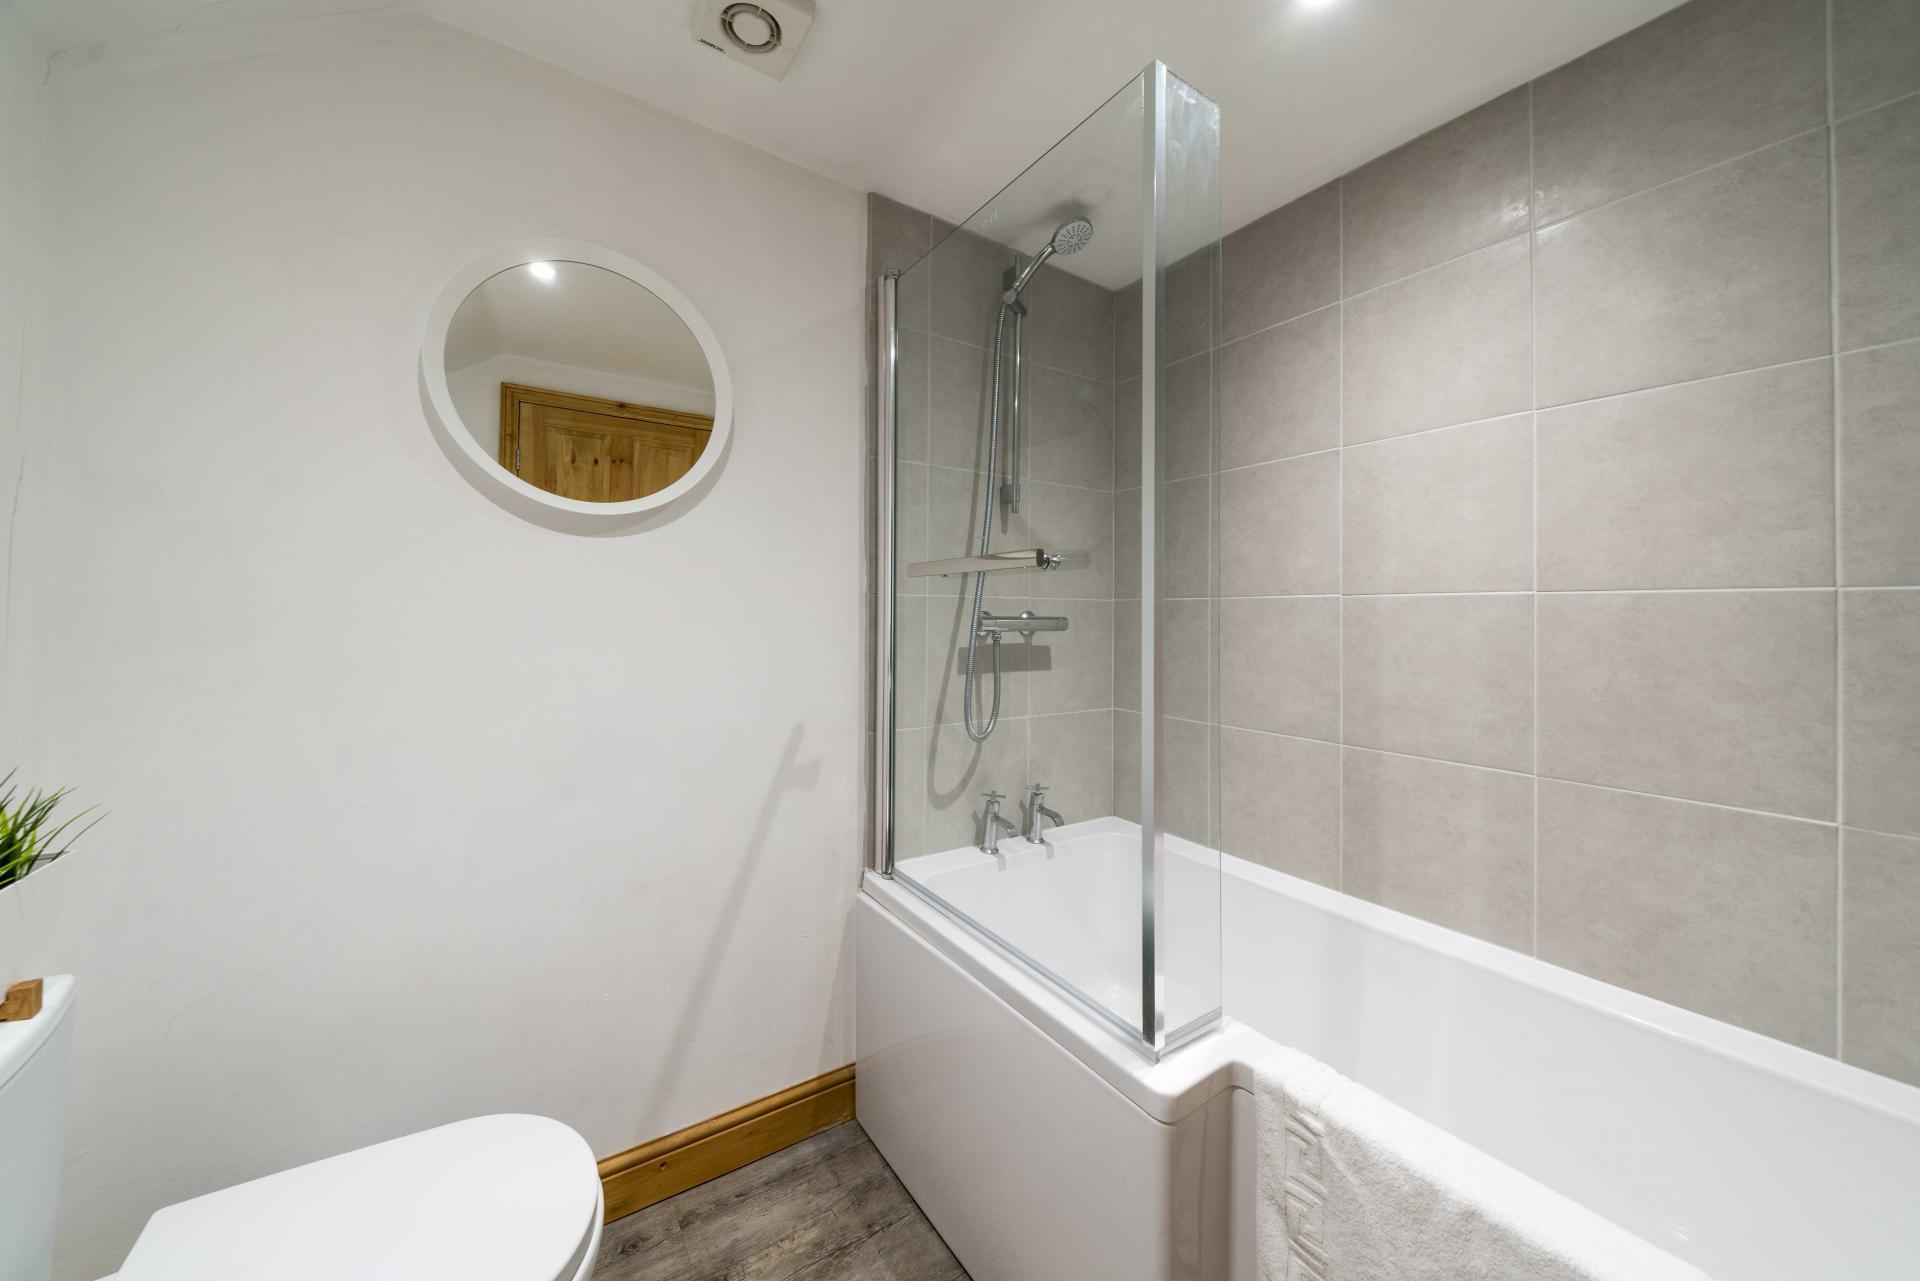 Bath 1 at Stocks Hill House